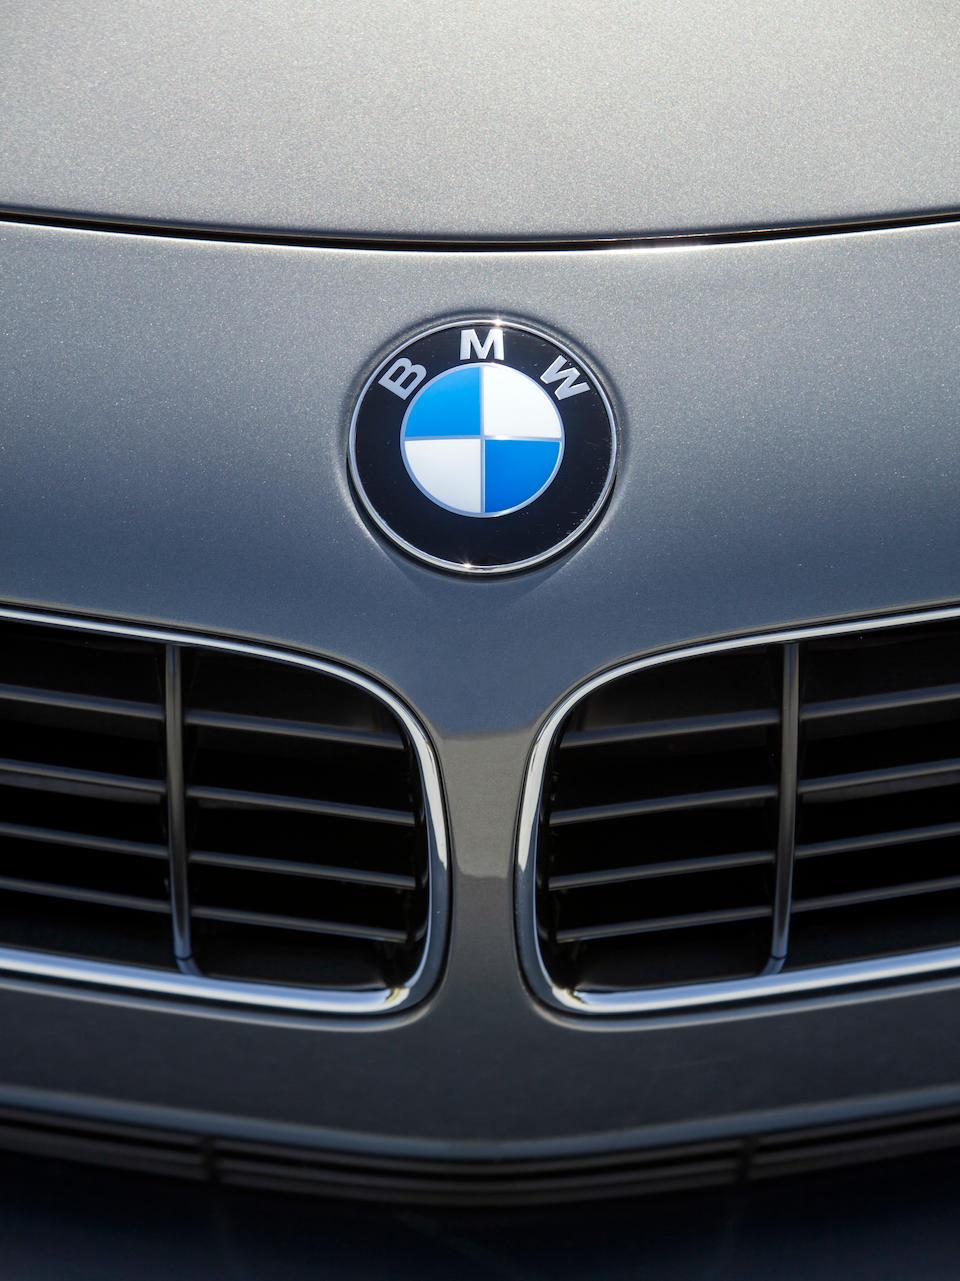 <b>2003 BMW Z8 Roadster</b><br />VIN. WBAEJ13403AH62055